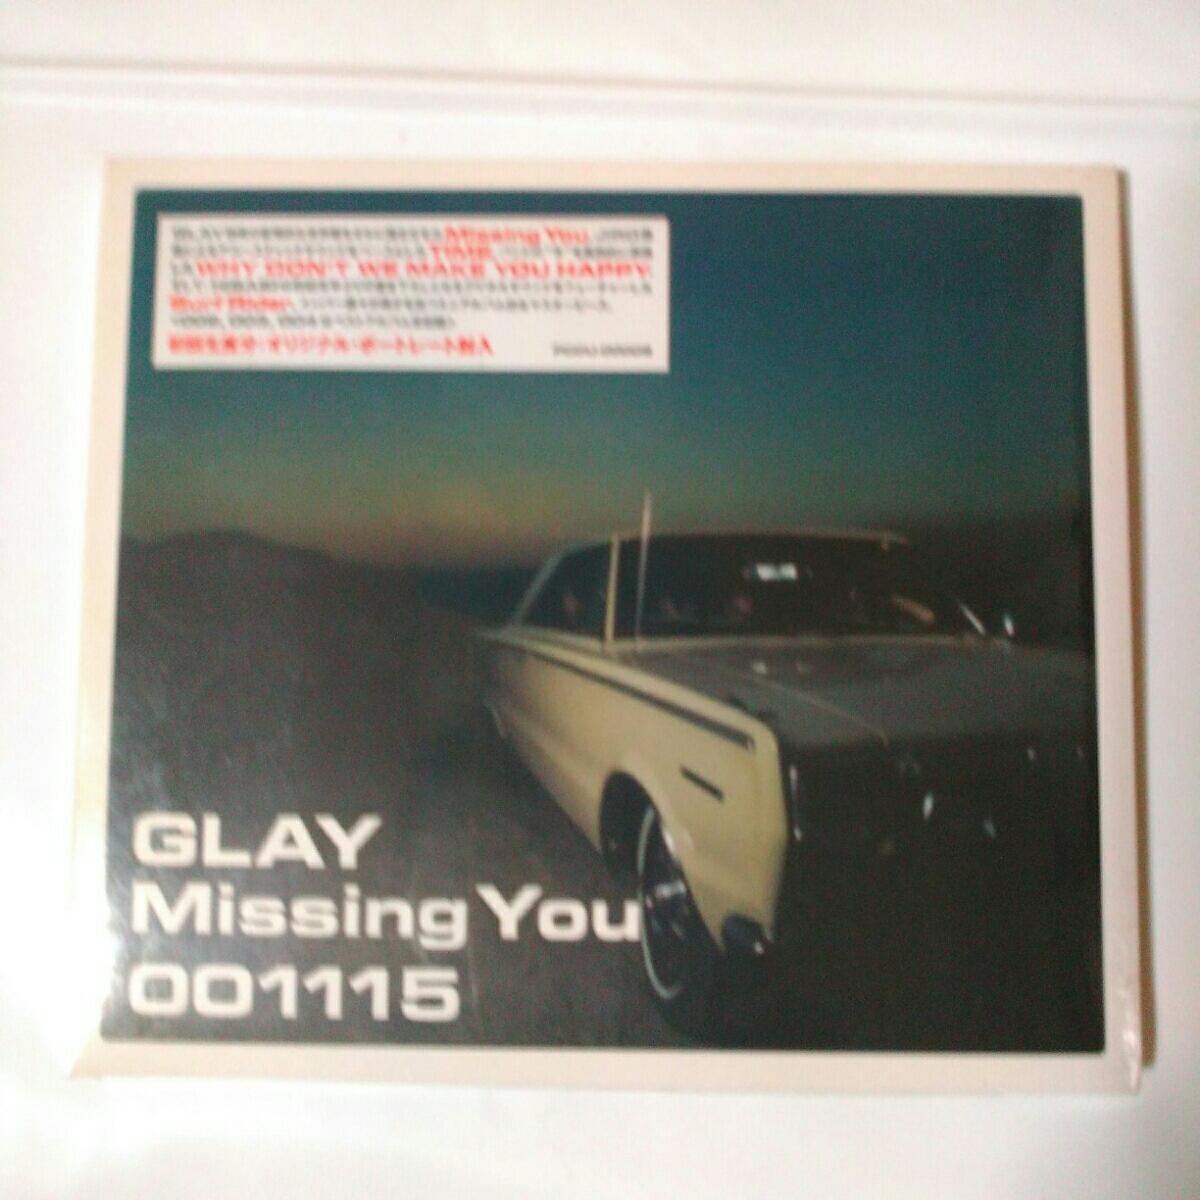 Glay missing you